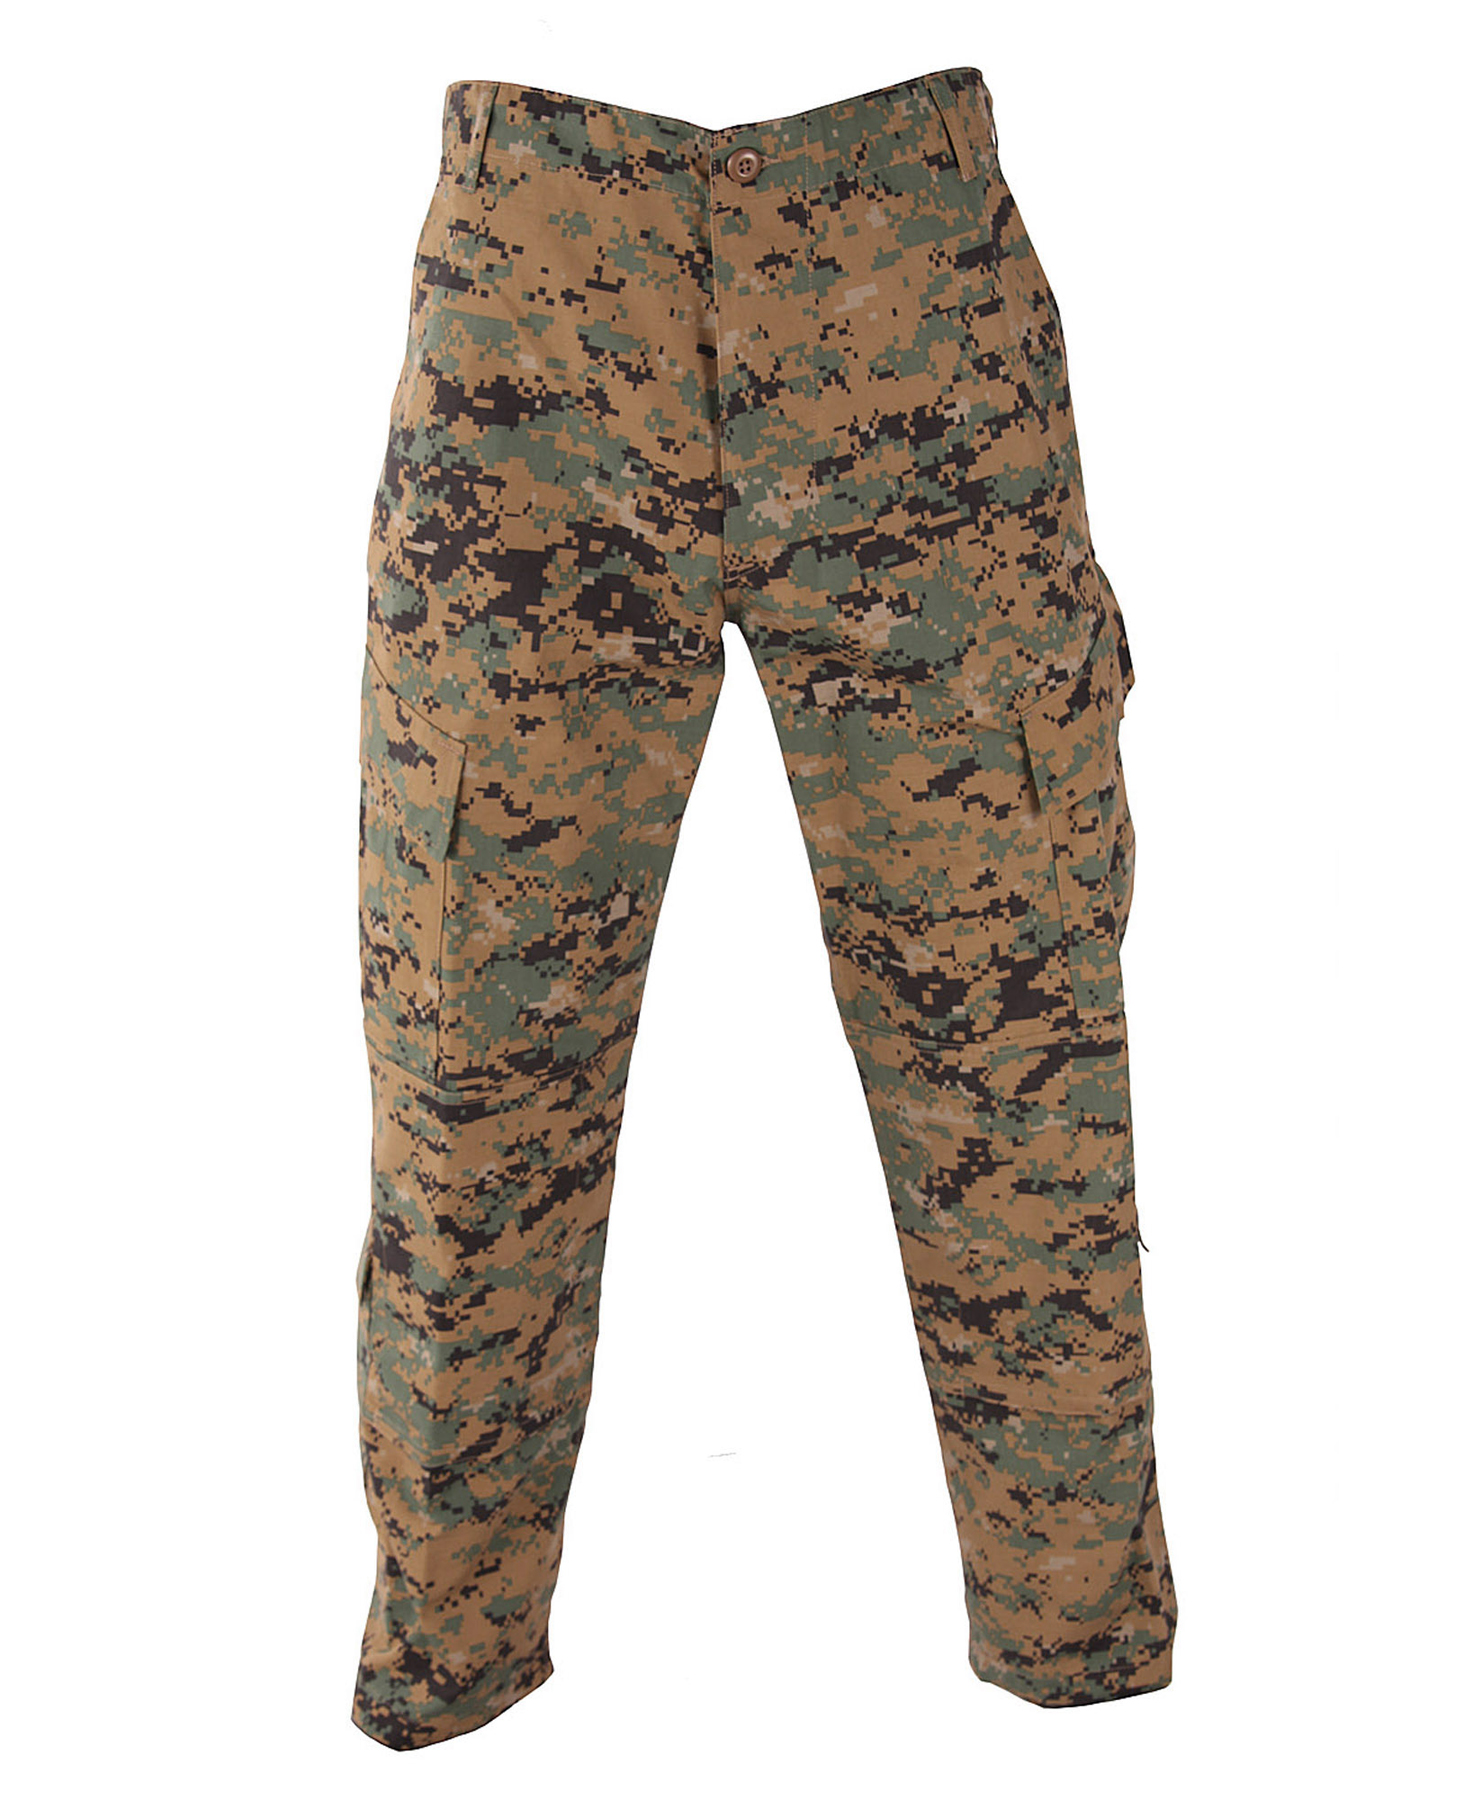 Unisex Battle Rip ACU Digital Trouser 65P/35C